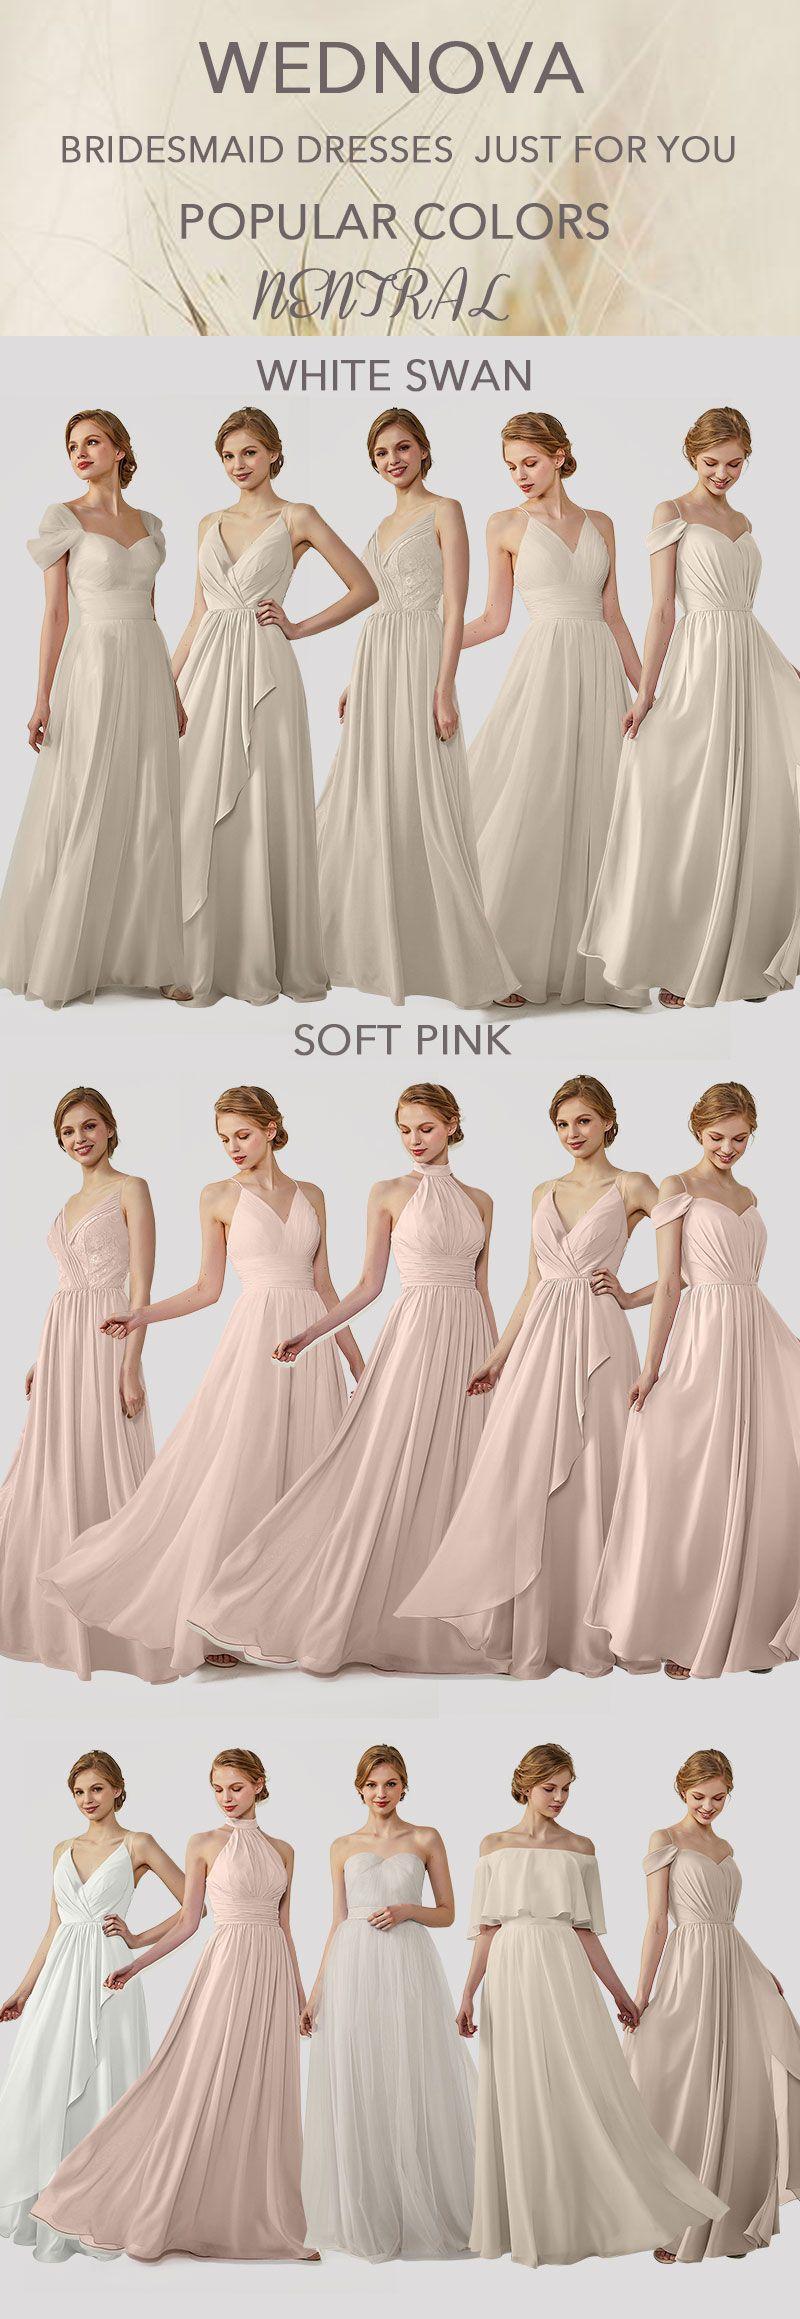 Top chiffon bridesmaid dresses neutral v neck dress you can wear